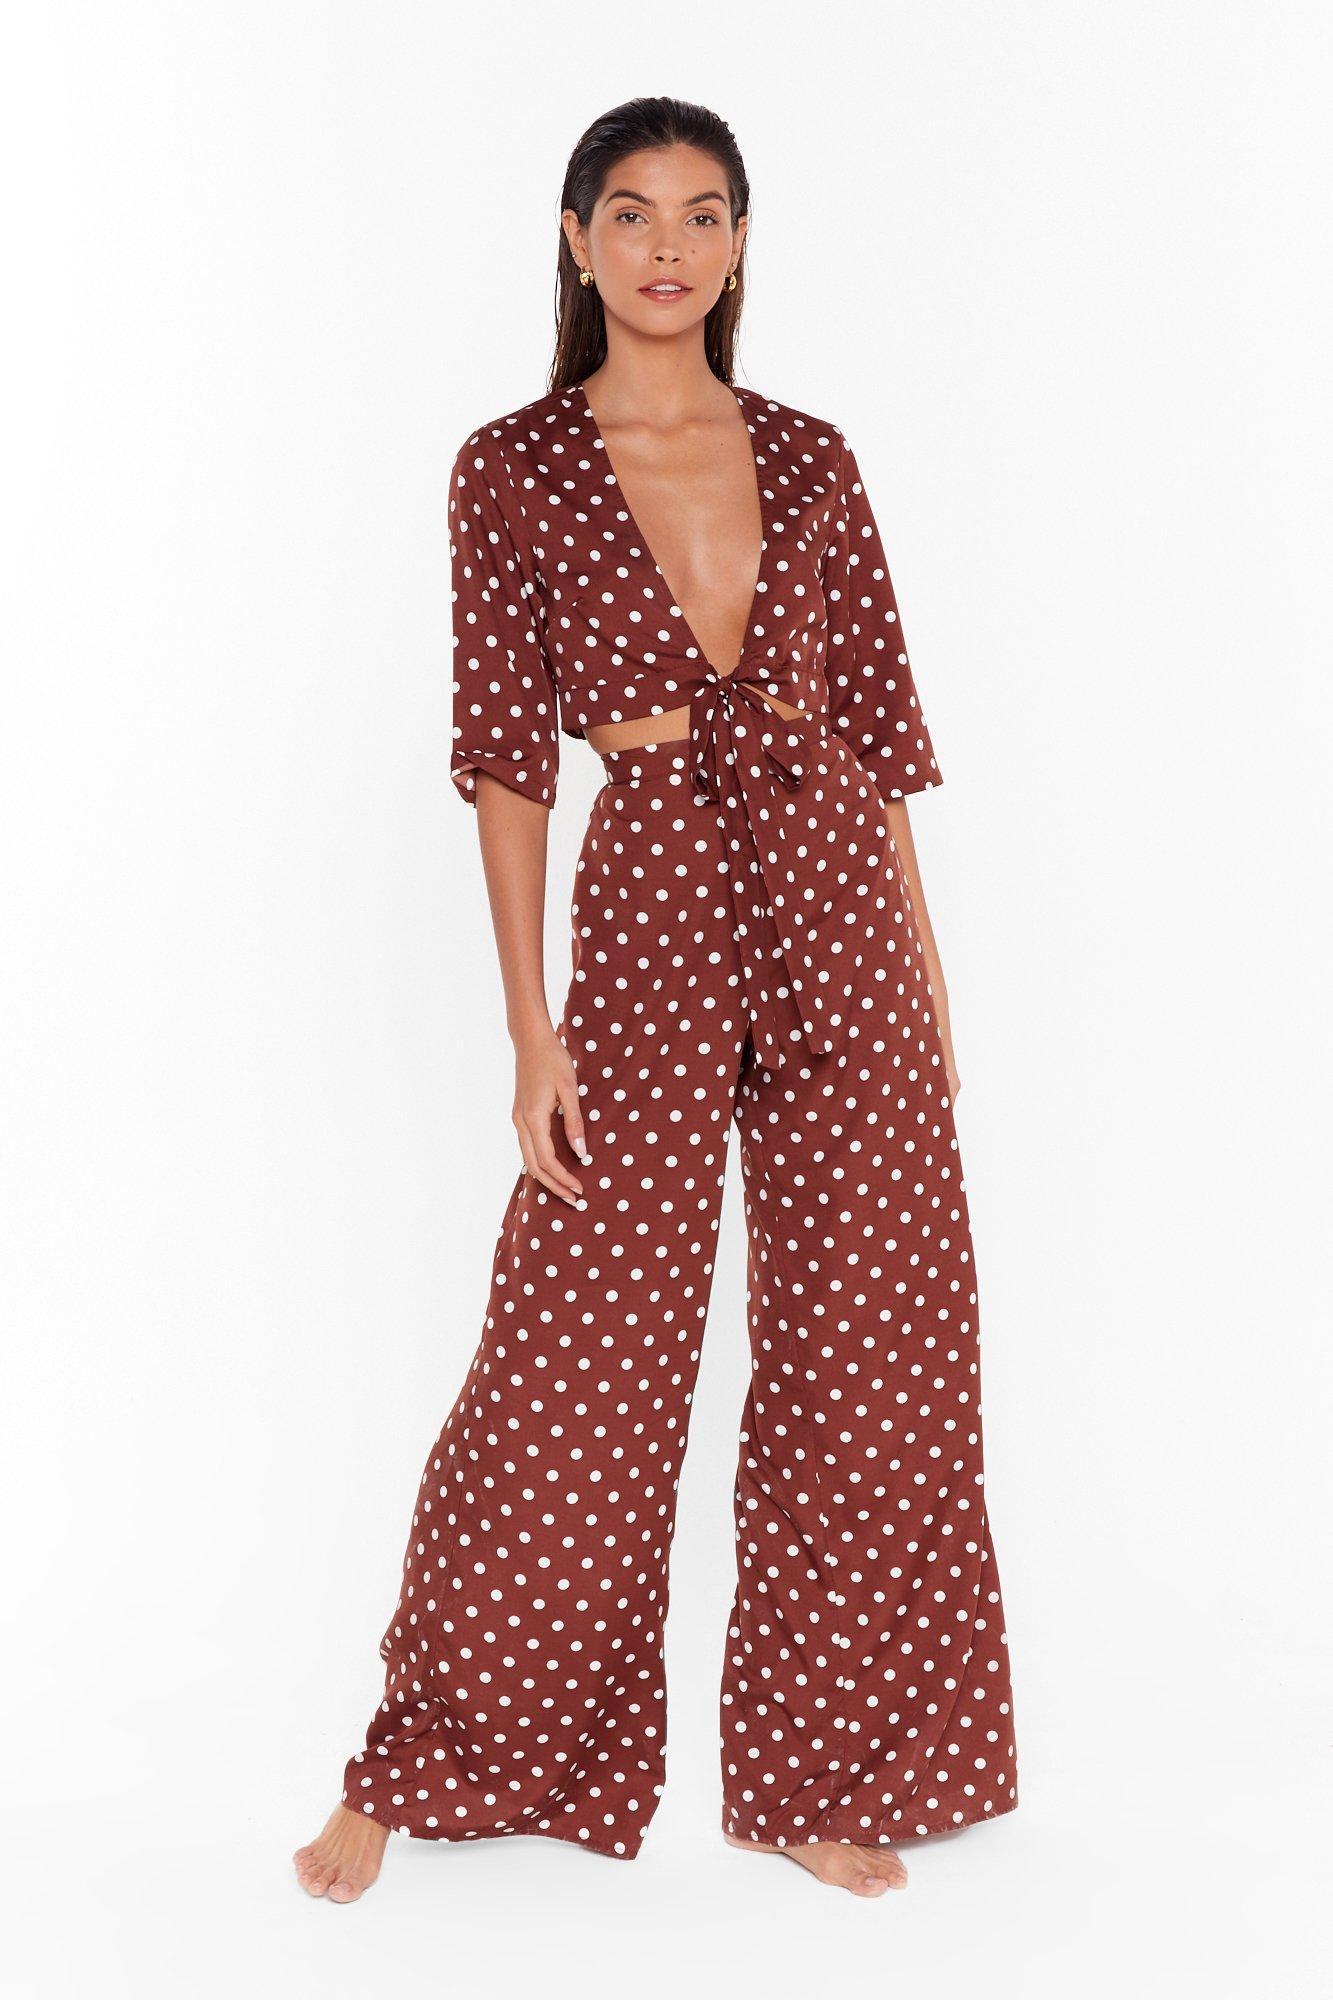 Image of Polka dot beach trousers